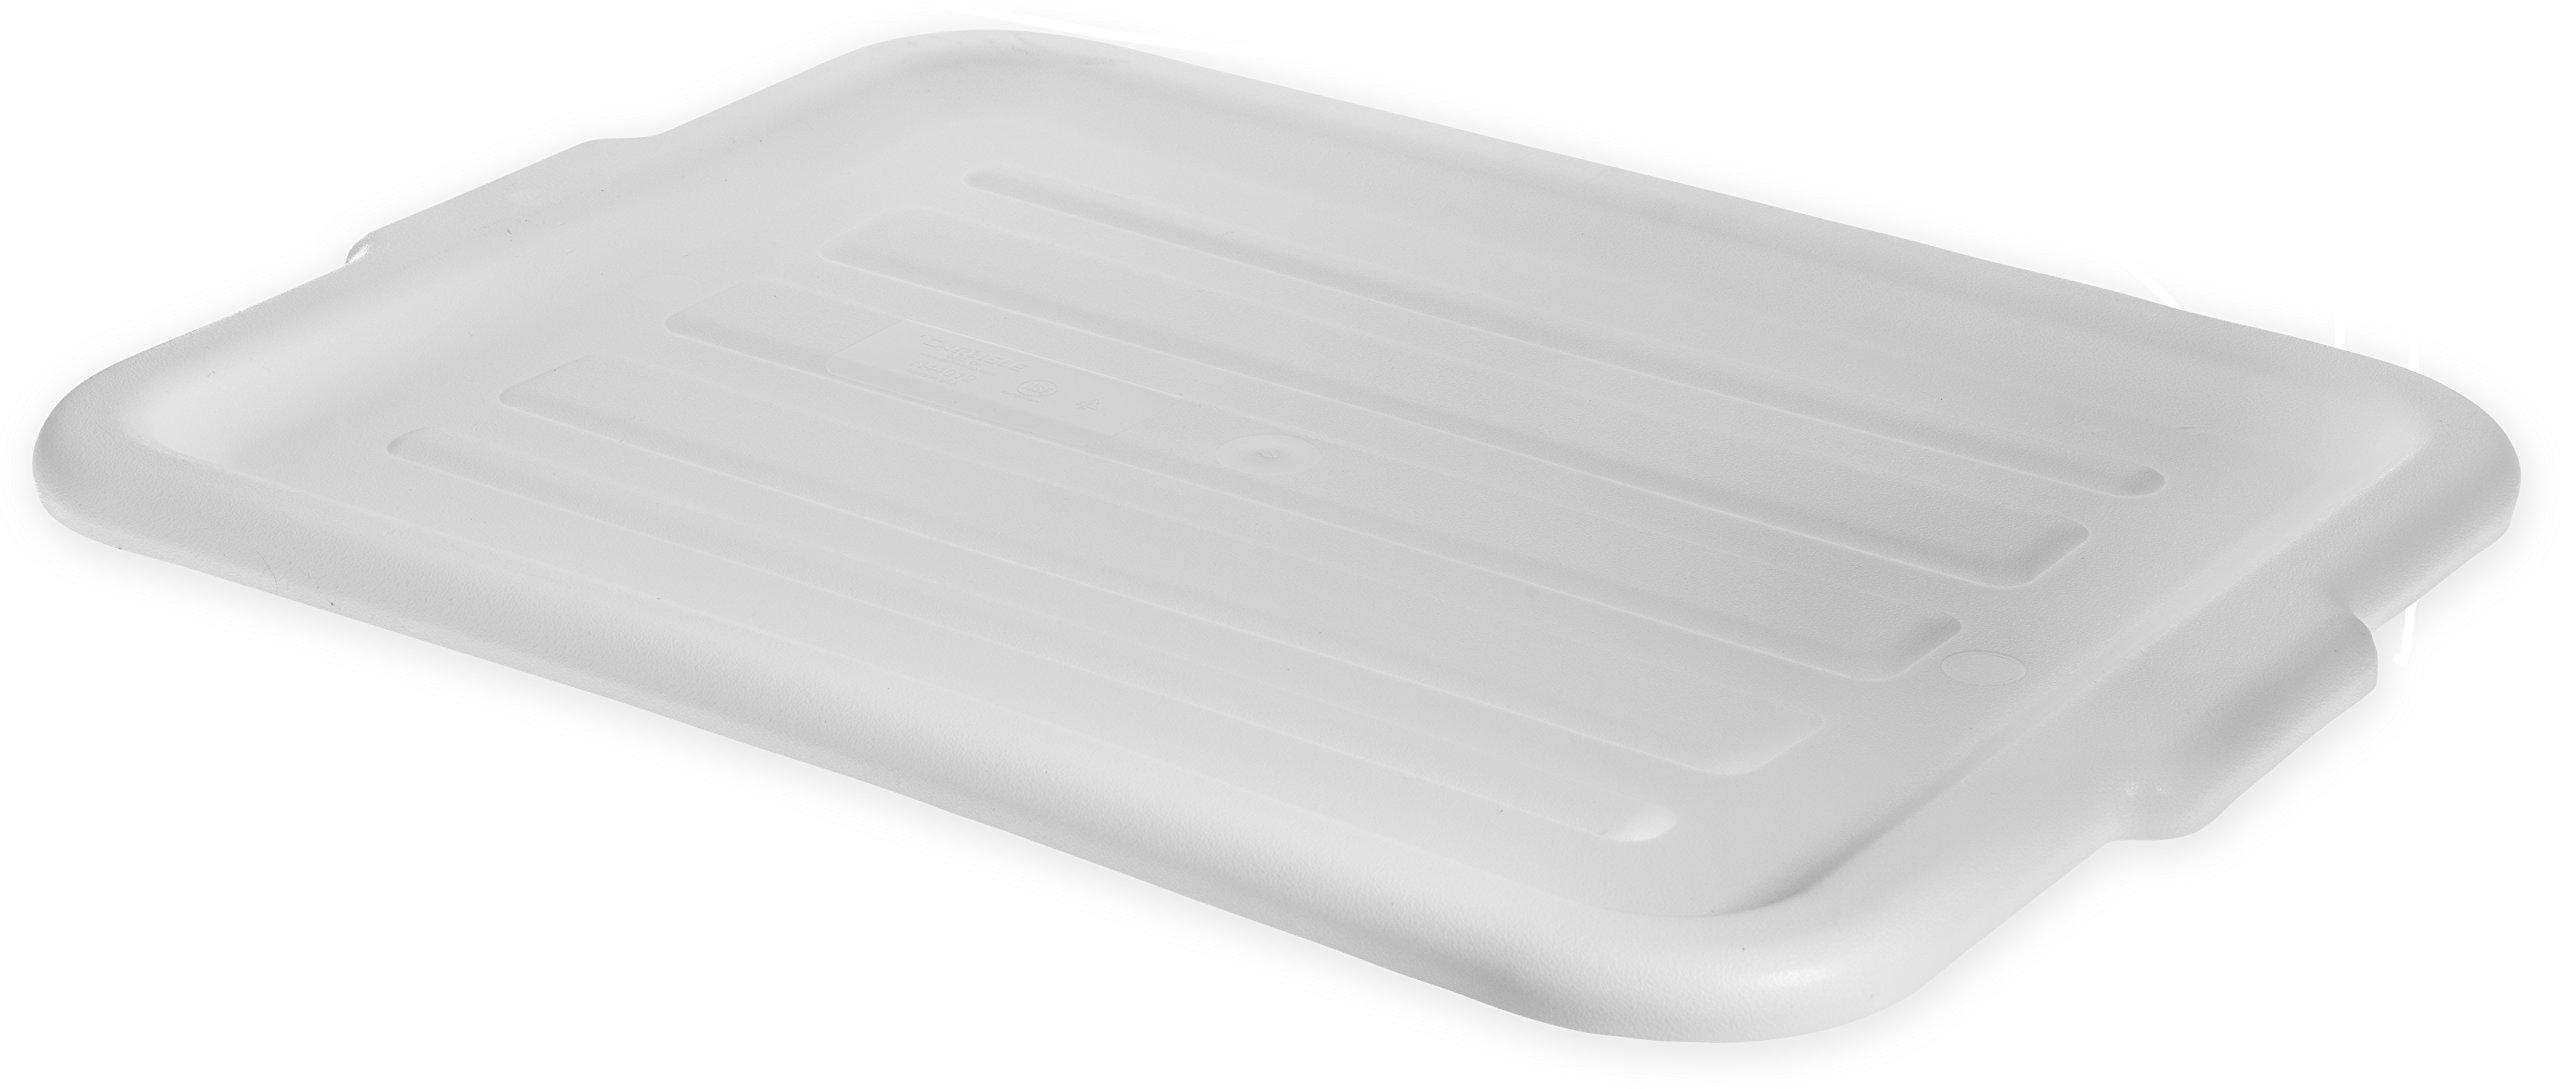 Carlisle N4401202 Comfort Curve Ergonomic Wash Basin Tote Box Lid, Universal, White (Pack of 12)